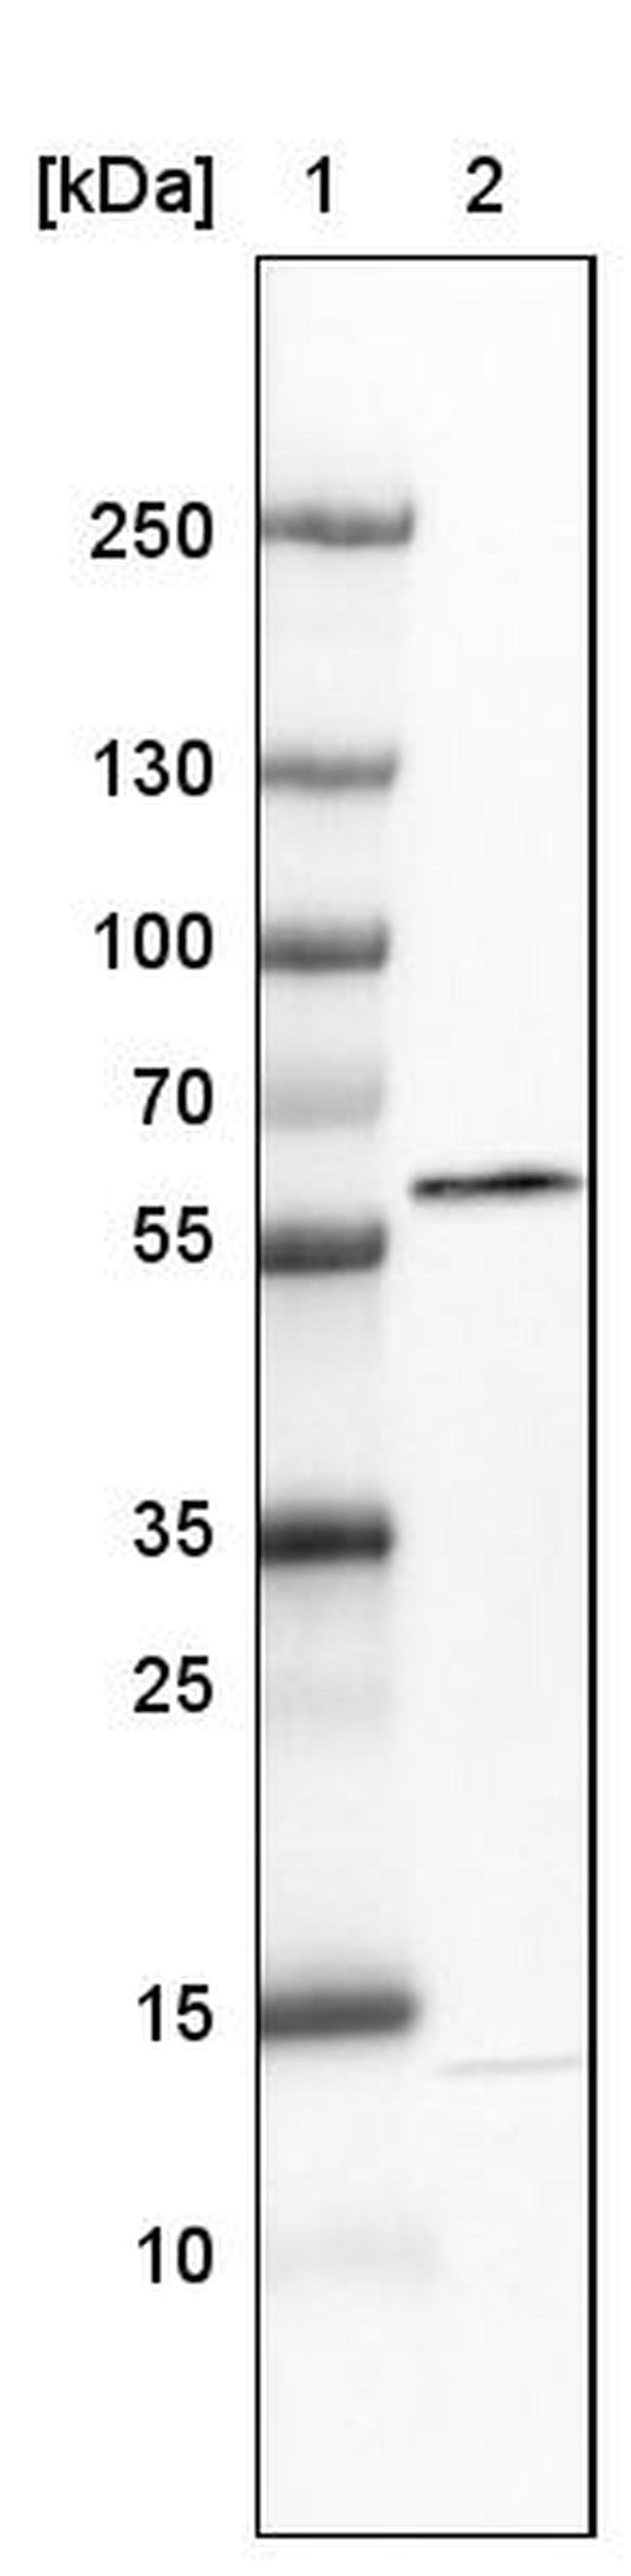 GRASP55 Antibody in Western Blot (WB)